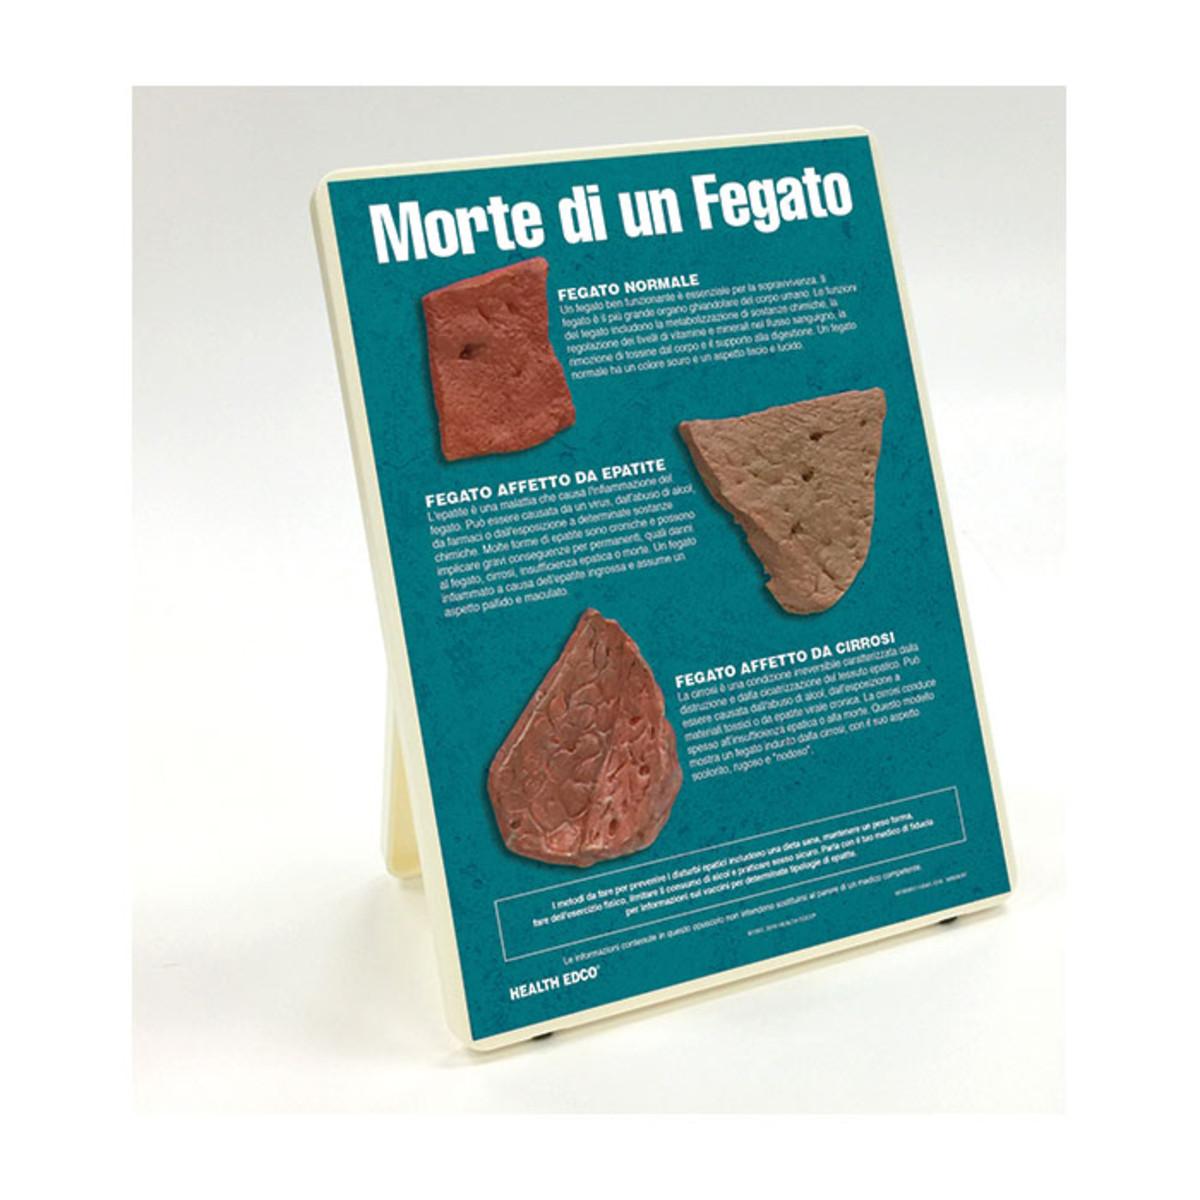 Health Edco; Italian; health education products; liver disease; hepatitis; cirrhotic liver; alcohol abuse